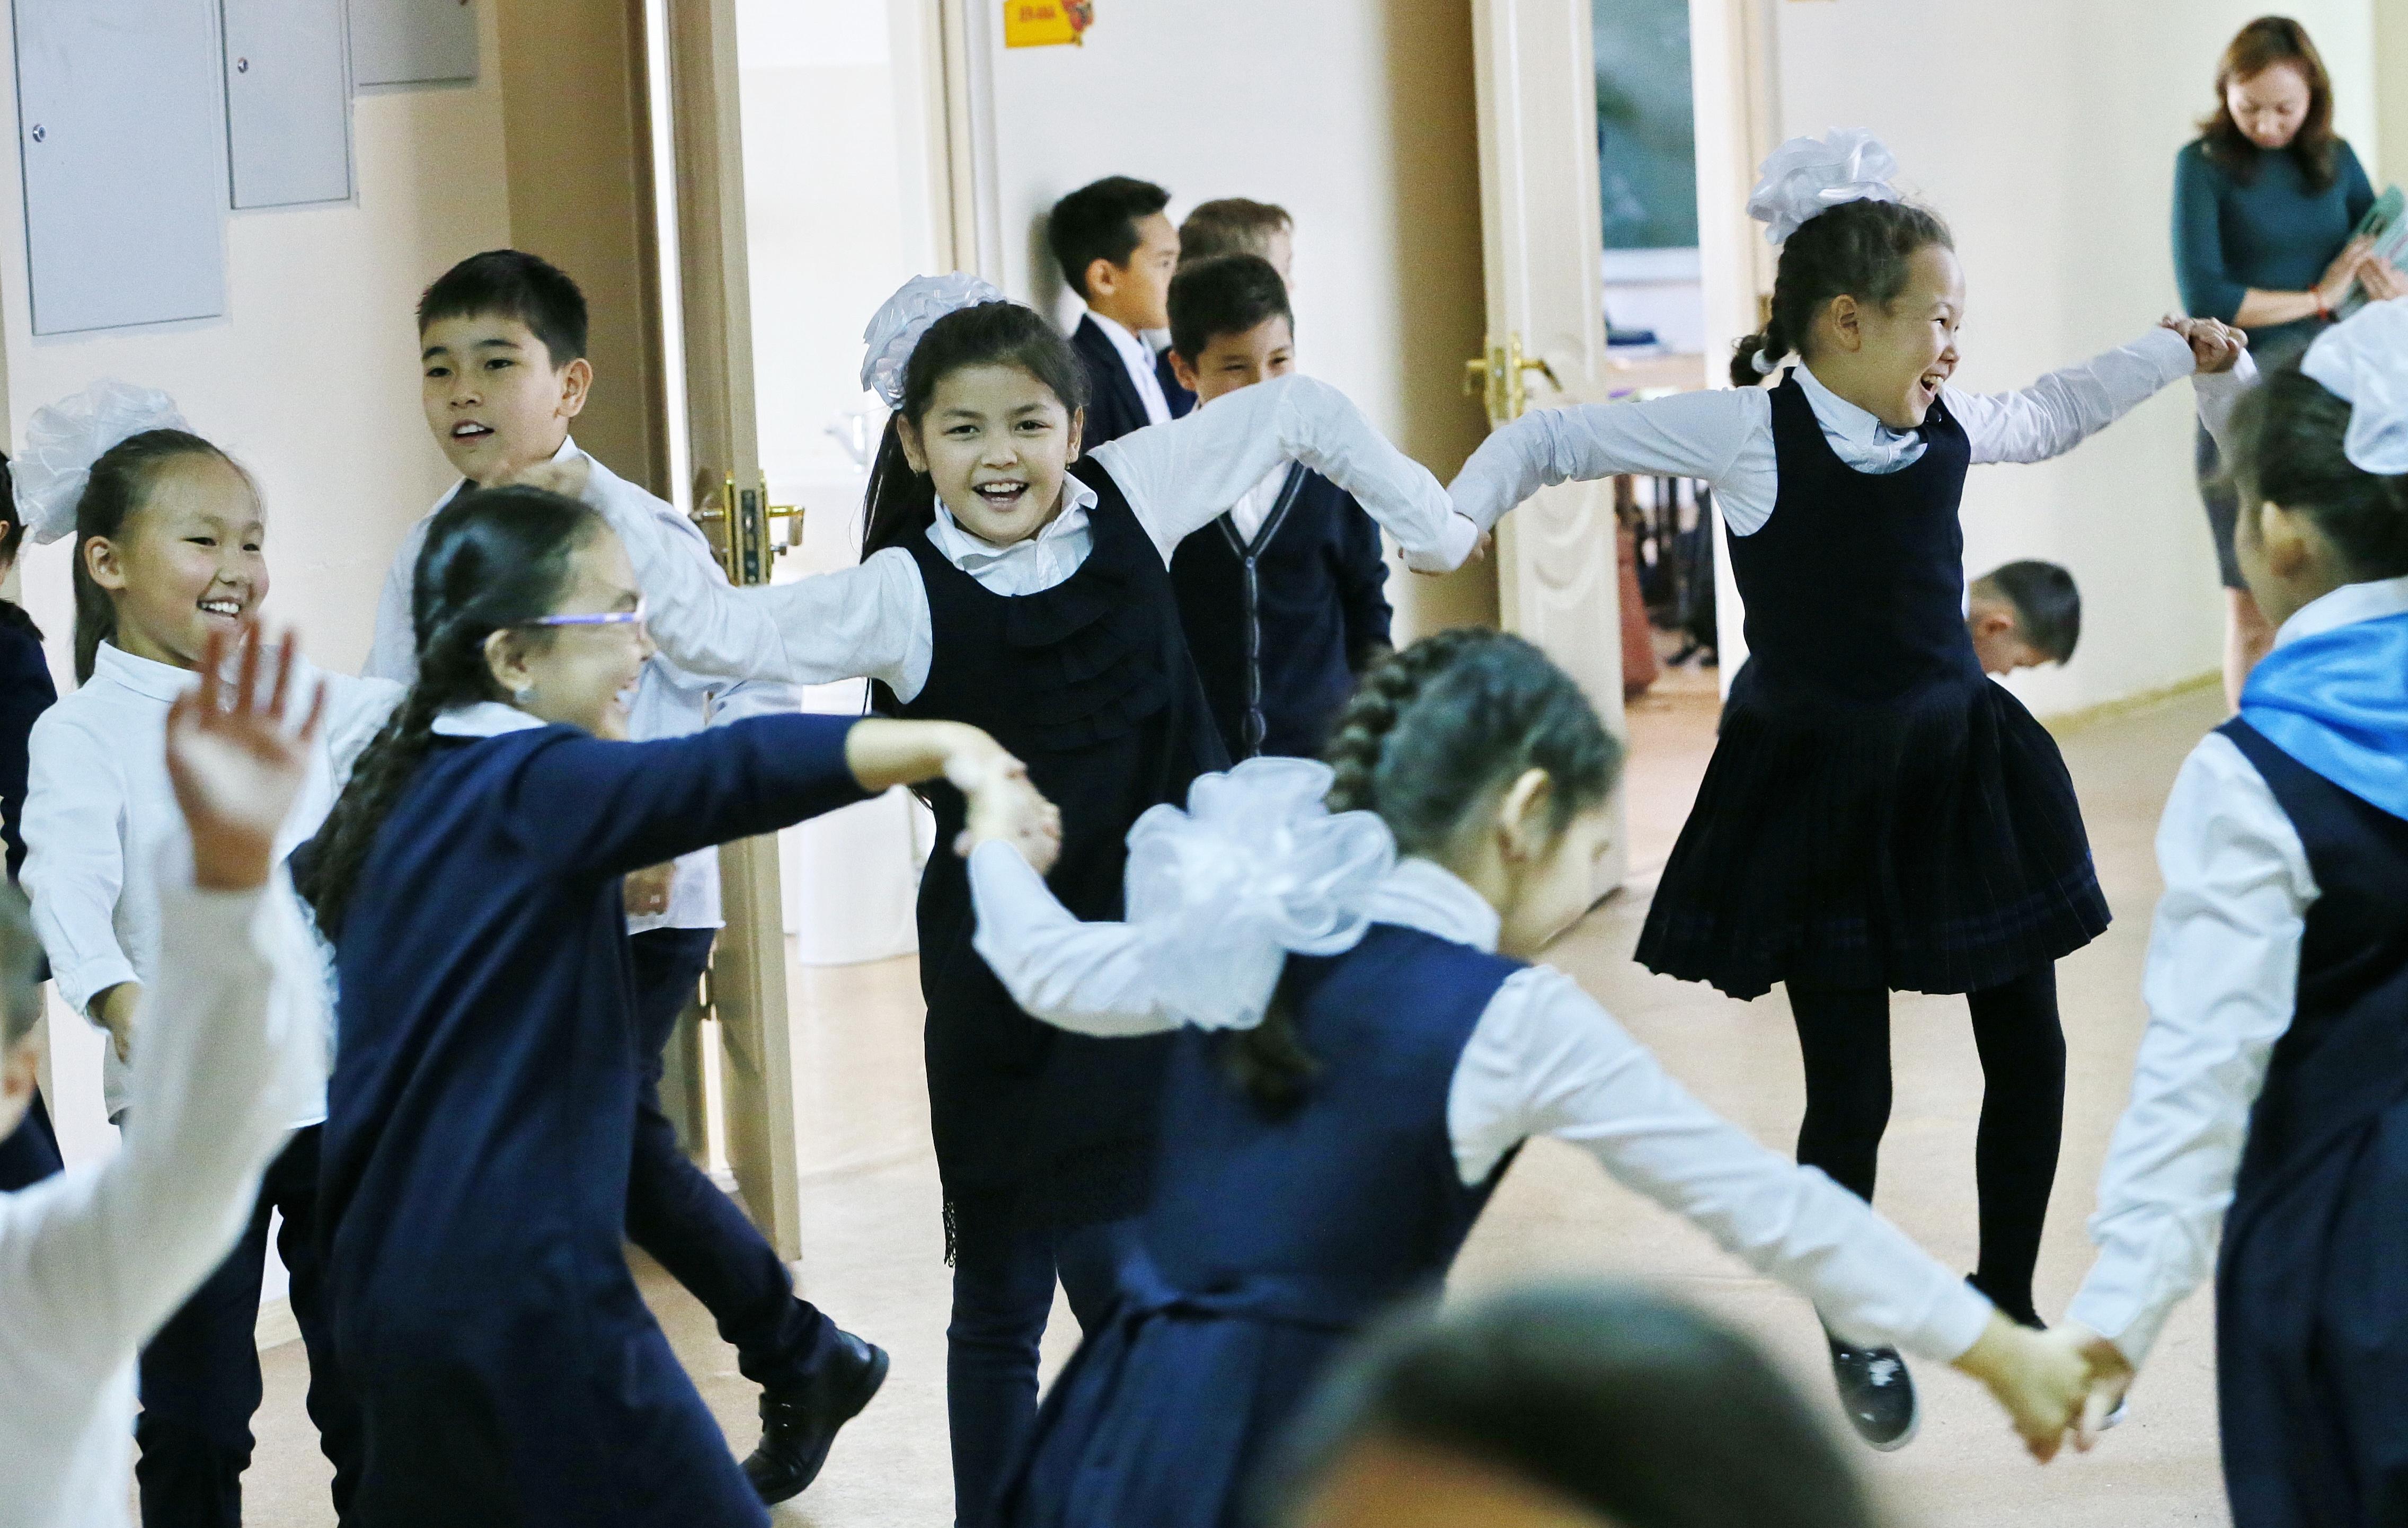 Kazakhstan rehabilitating children recently returned from Syria, Iraq